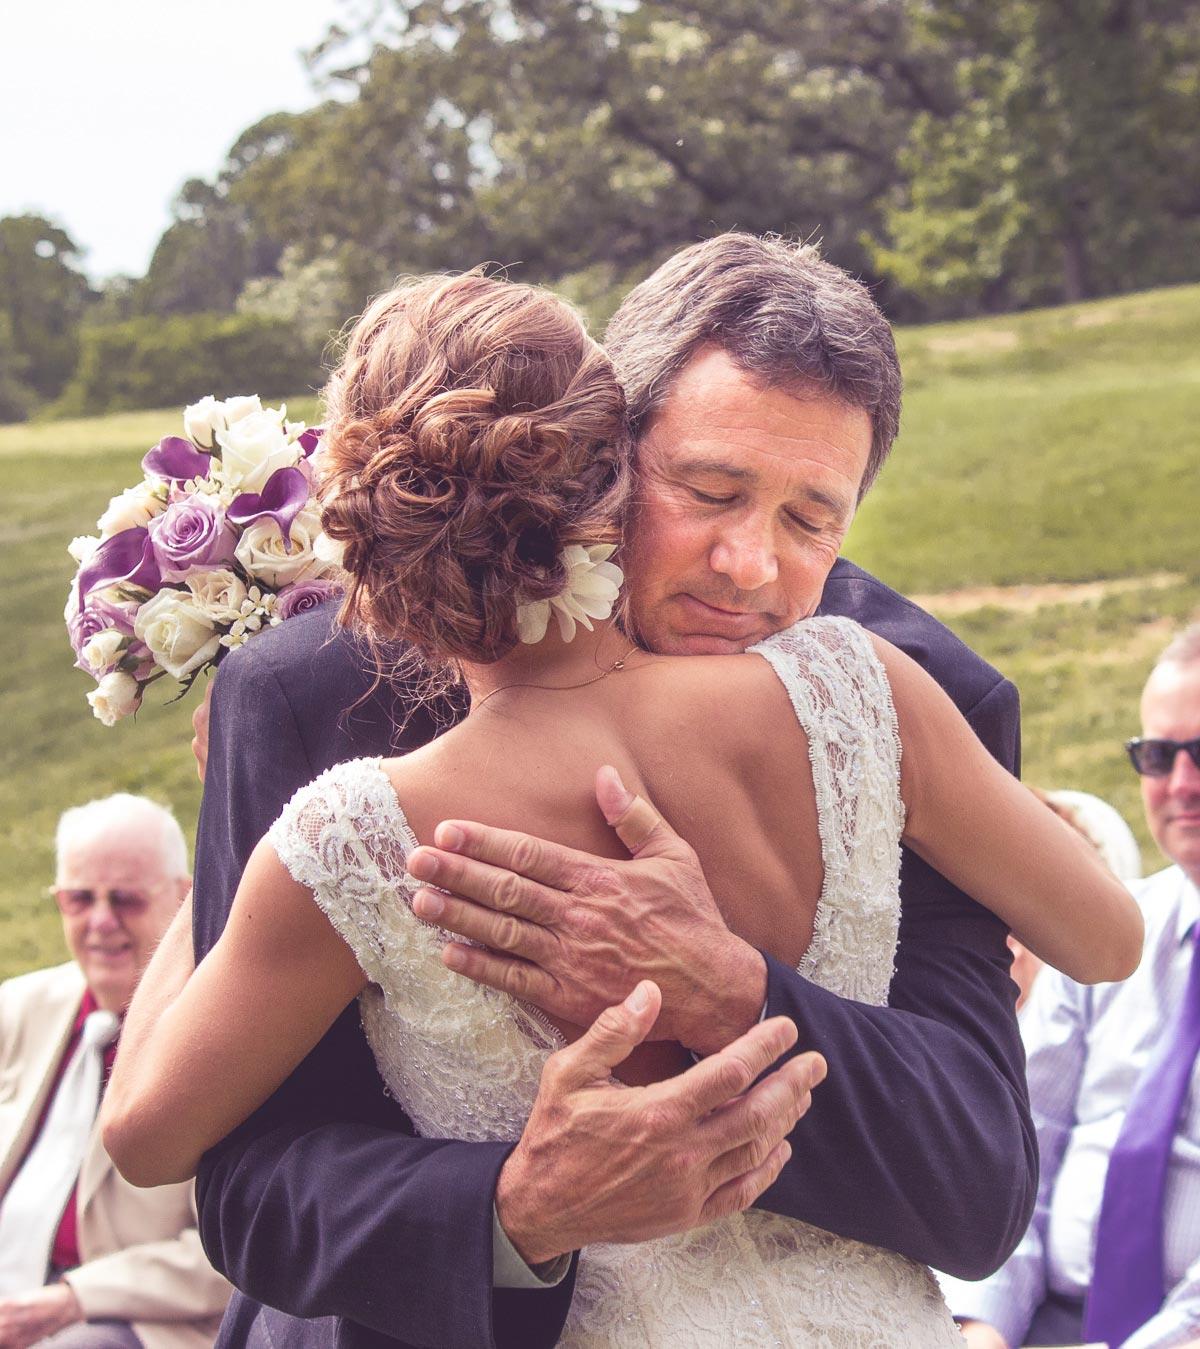 evansville-wedding-photographer-pabst-photo-kokies-echo-valley-(58)